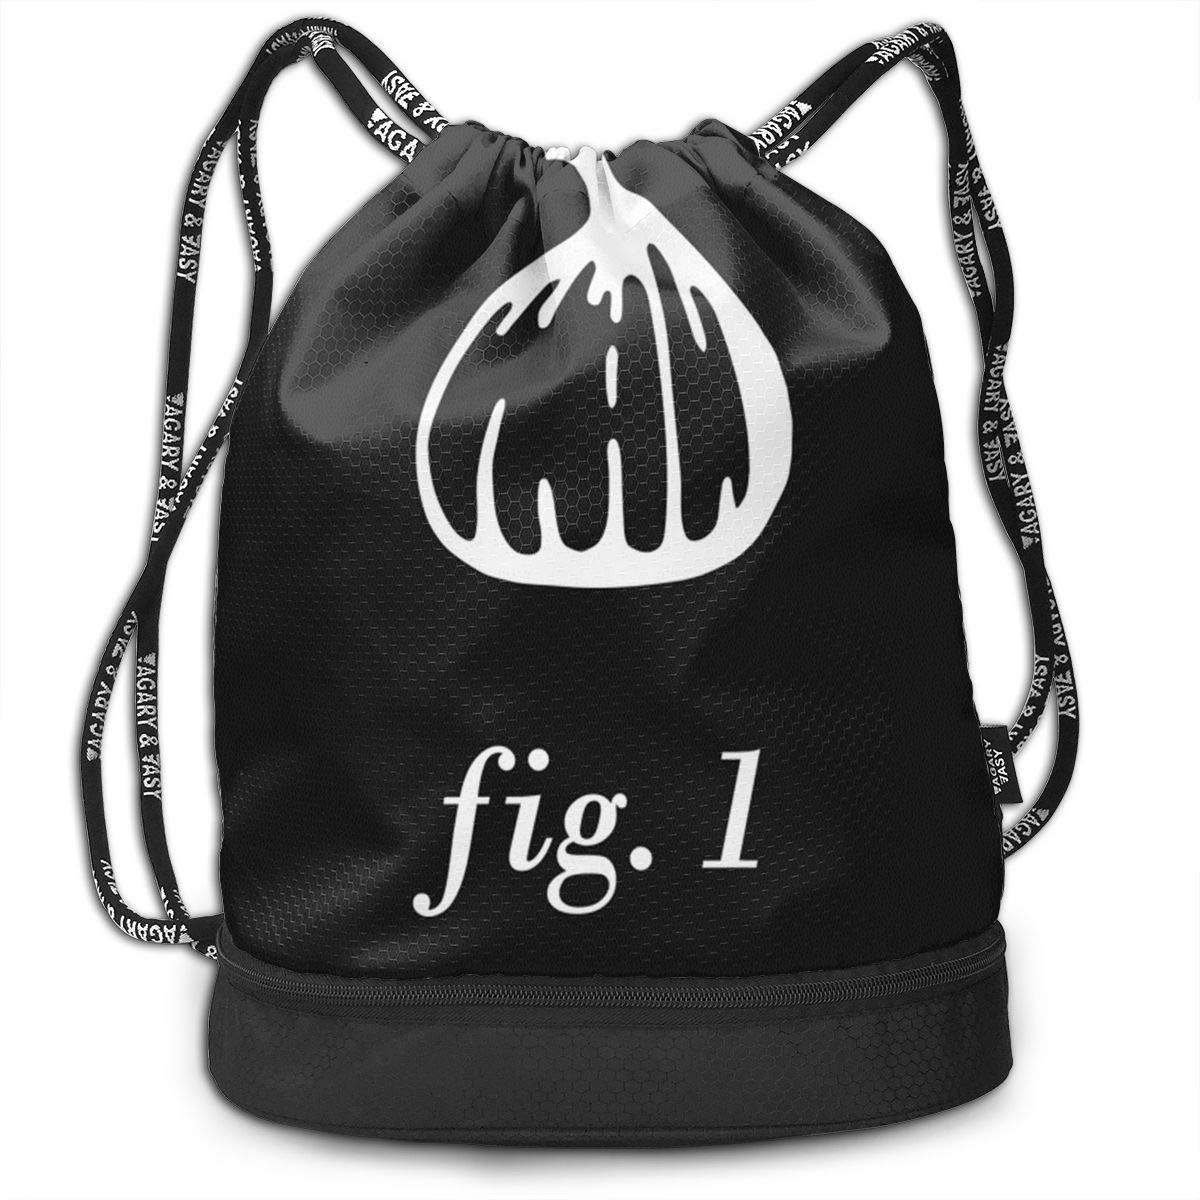 1 Cinch Backpack Sackpack Tote Sack Fig Zol1Q Lightweight Waterproof Large Storage Drawstring Bag for Men /& Women